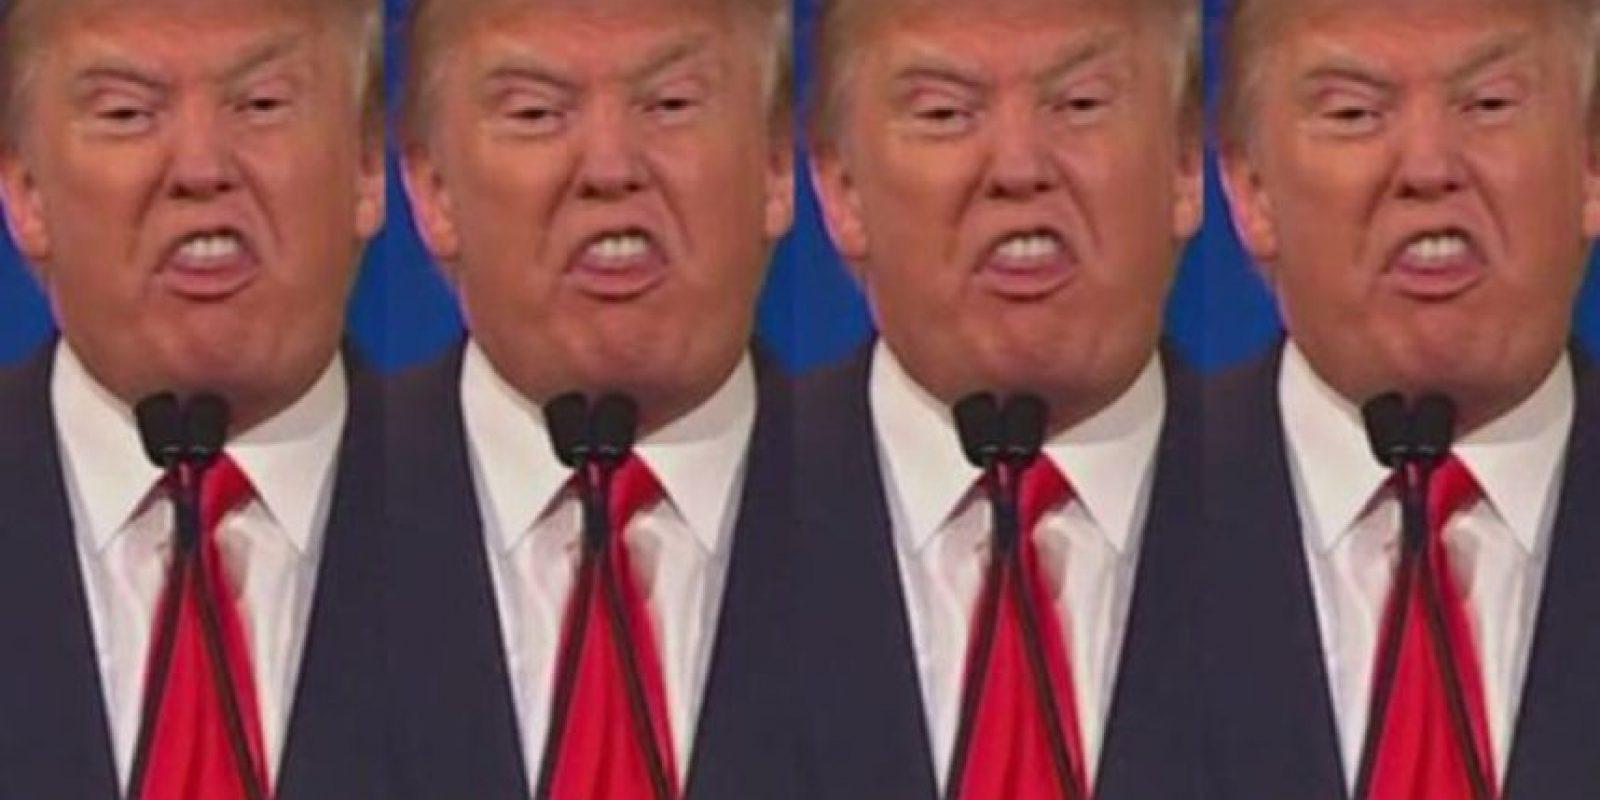 Sí, no solo Donald Trump fue la estrella. Foto:vía Twitter